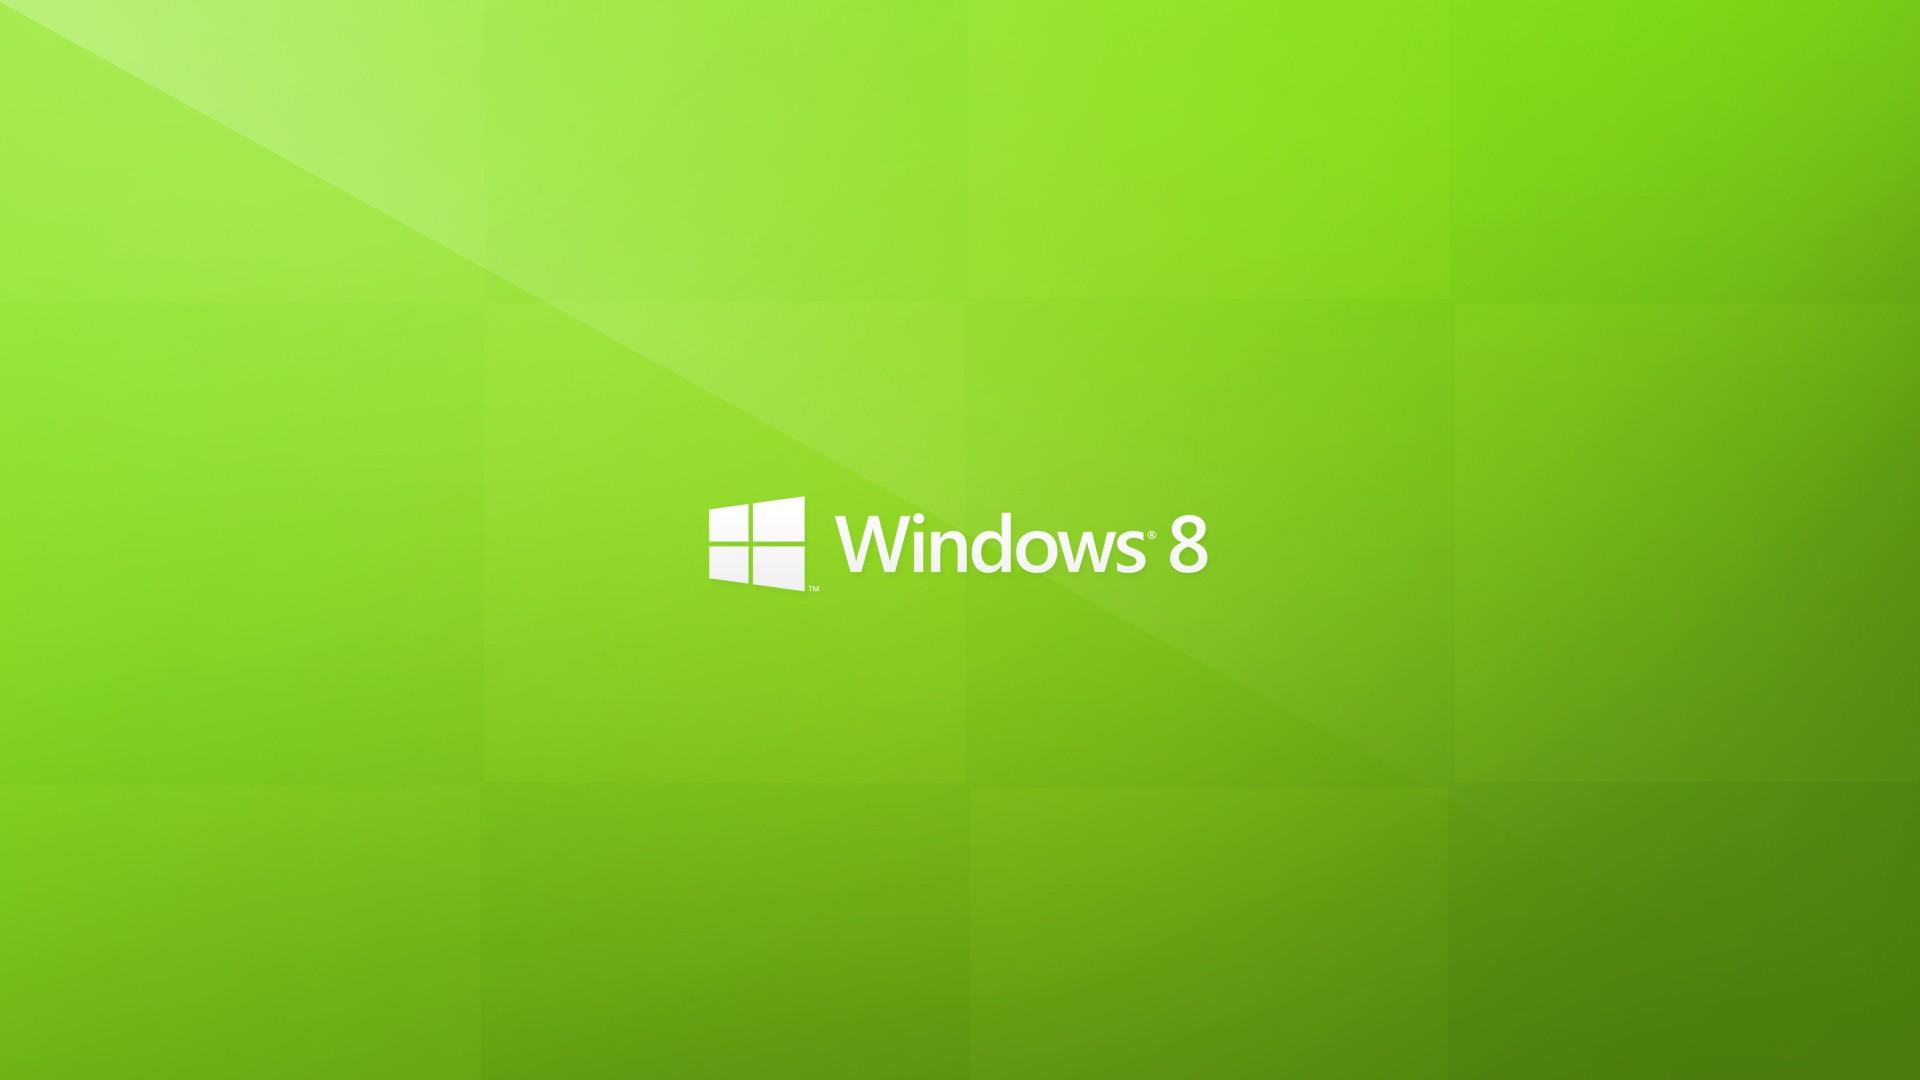 Animated Wallpaper For Laptop Windows 7 Hd Wallpapers For Windows 8 Pixelstalk Net